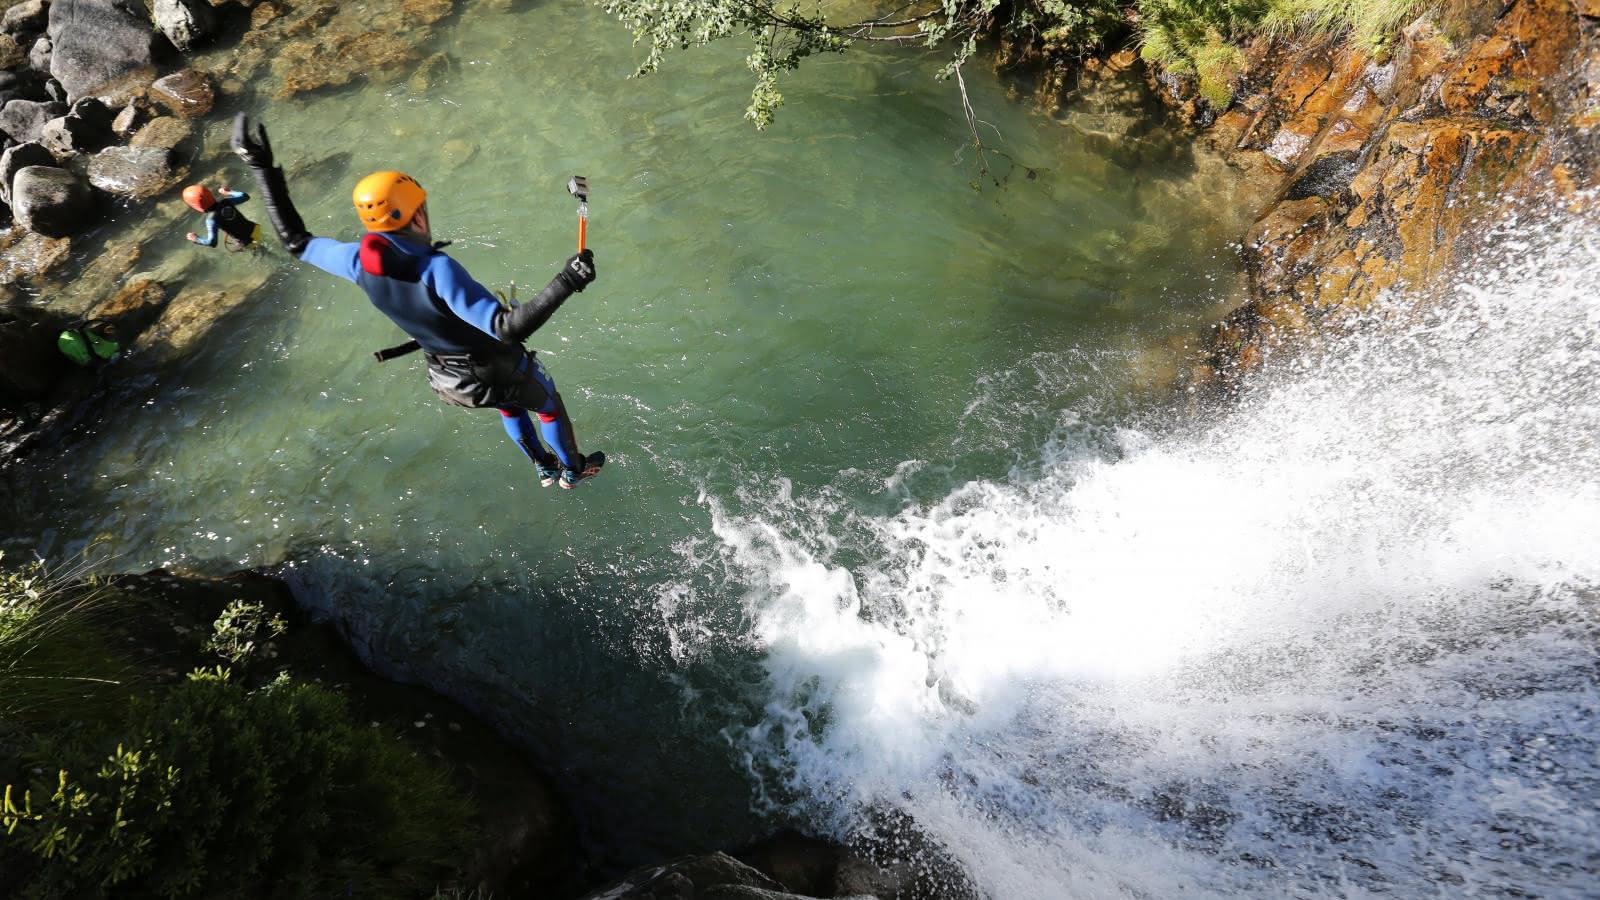 Canyon - Cie des Guides de Chamonix